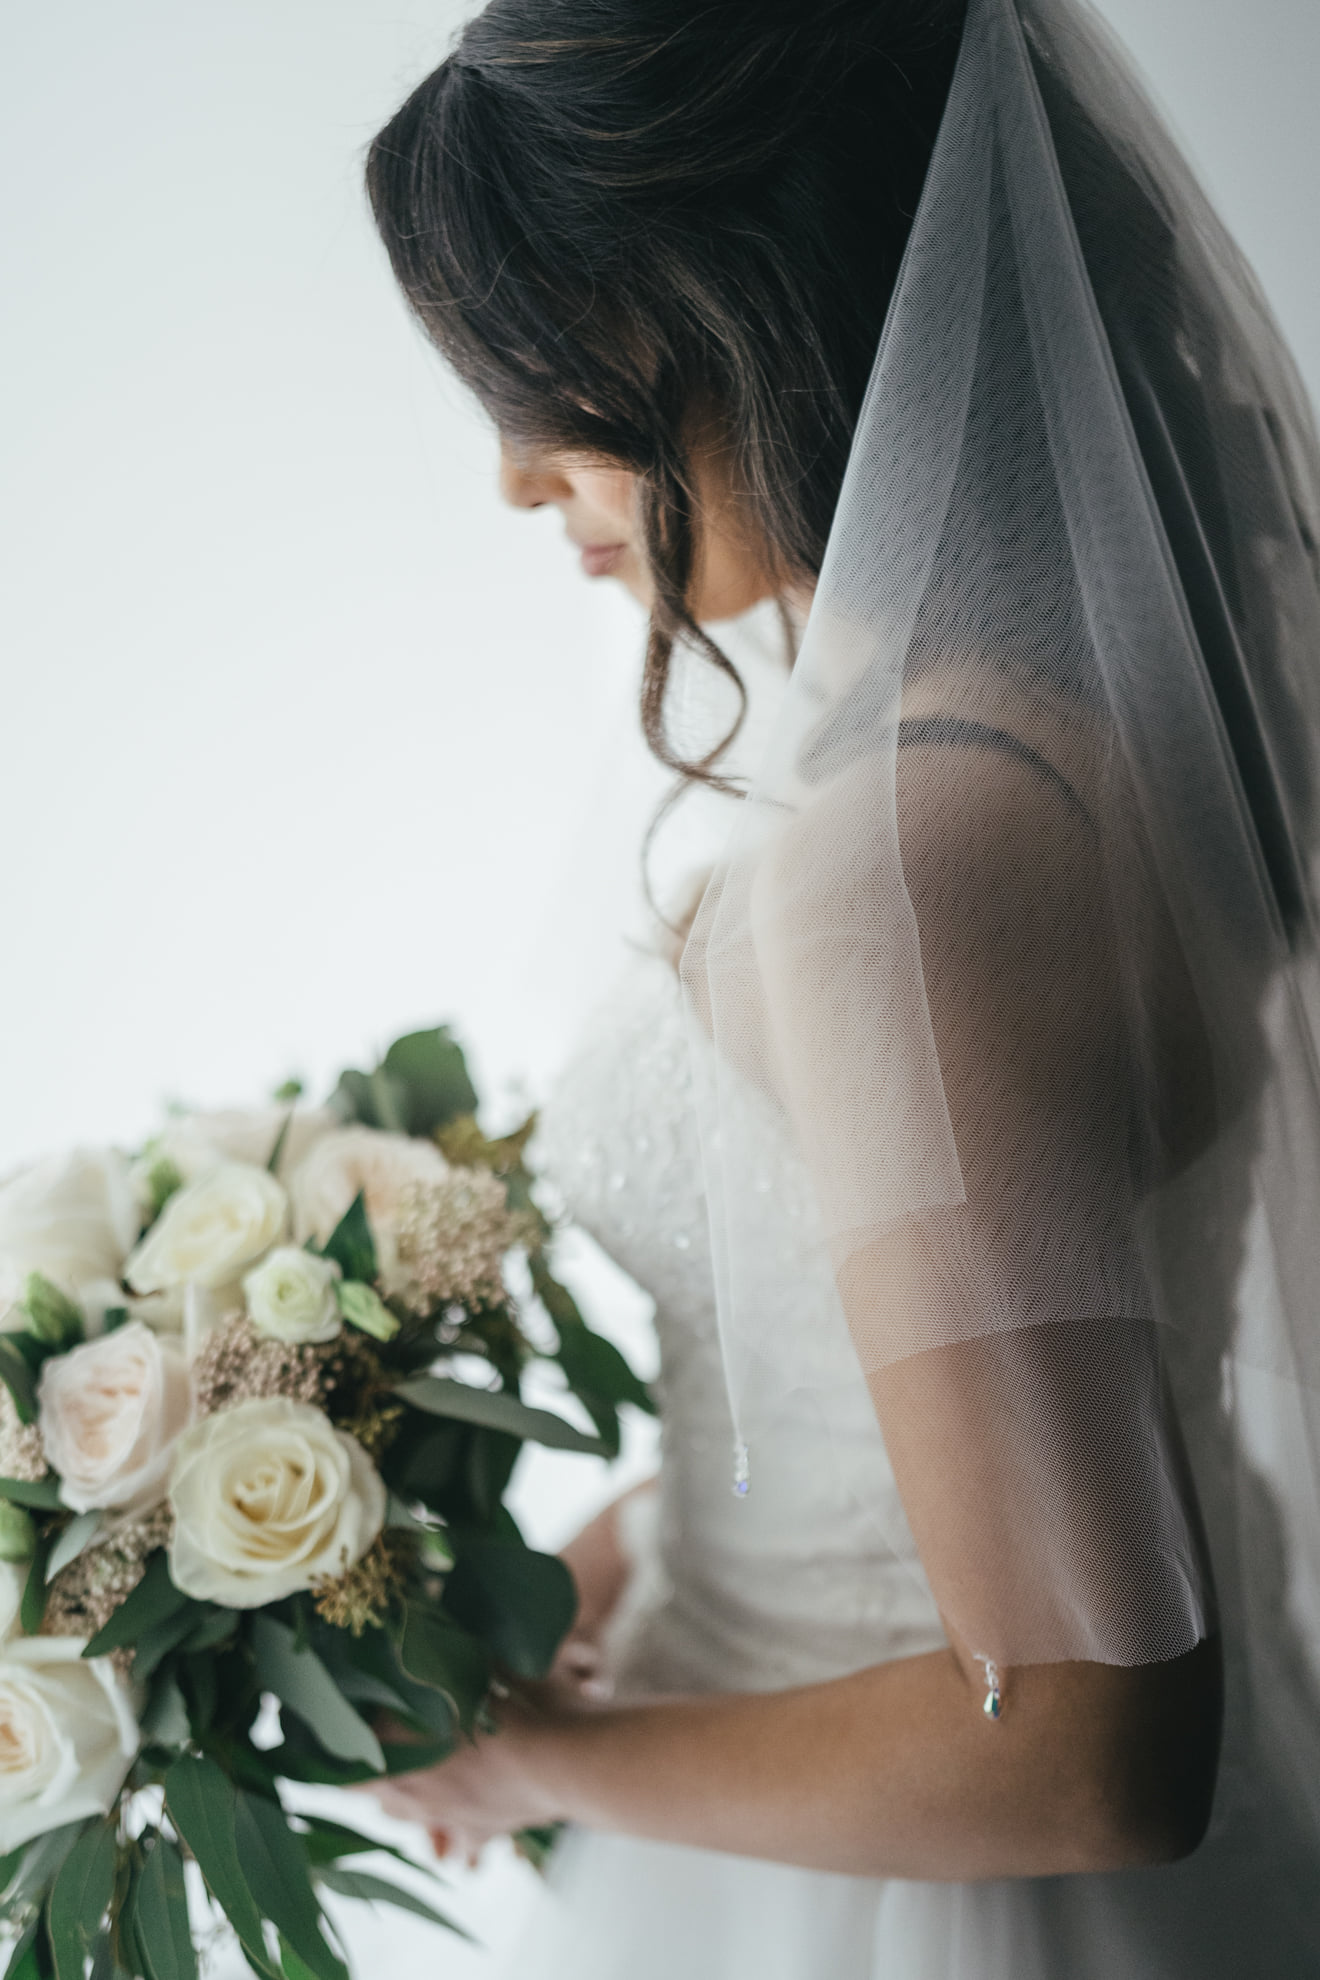 Melbourne bridal alterations